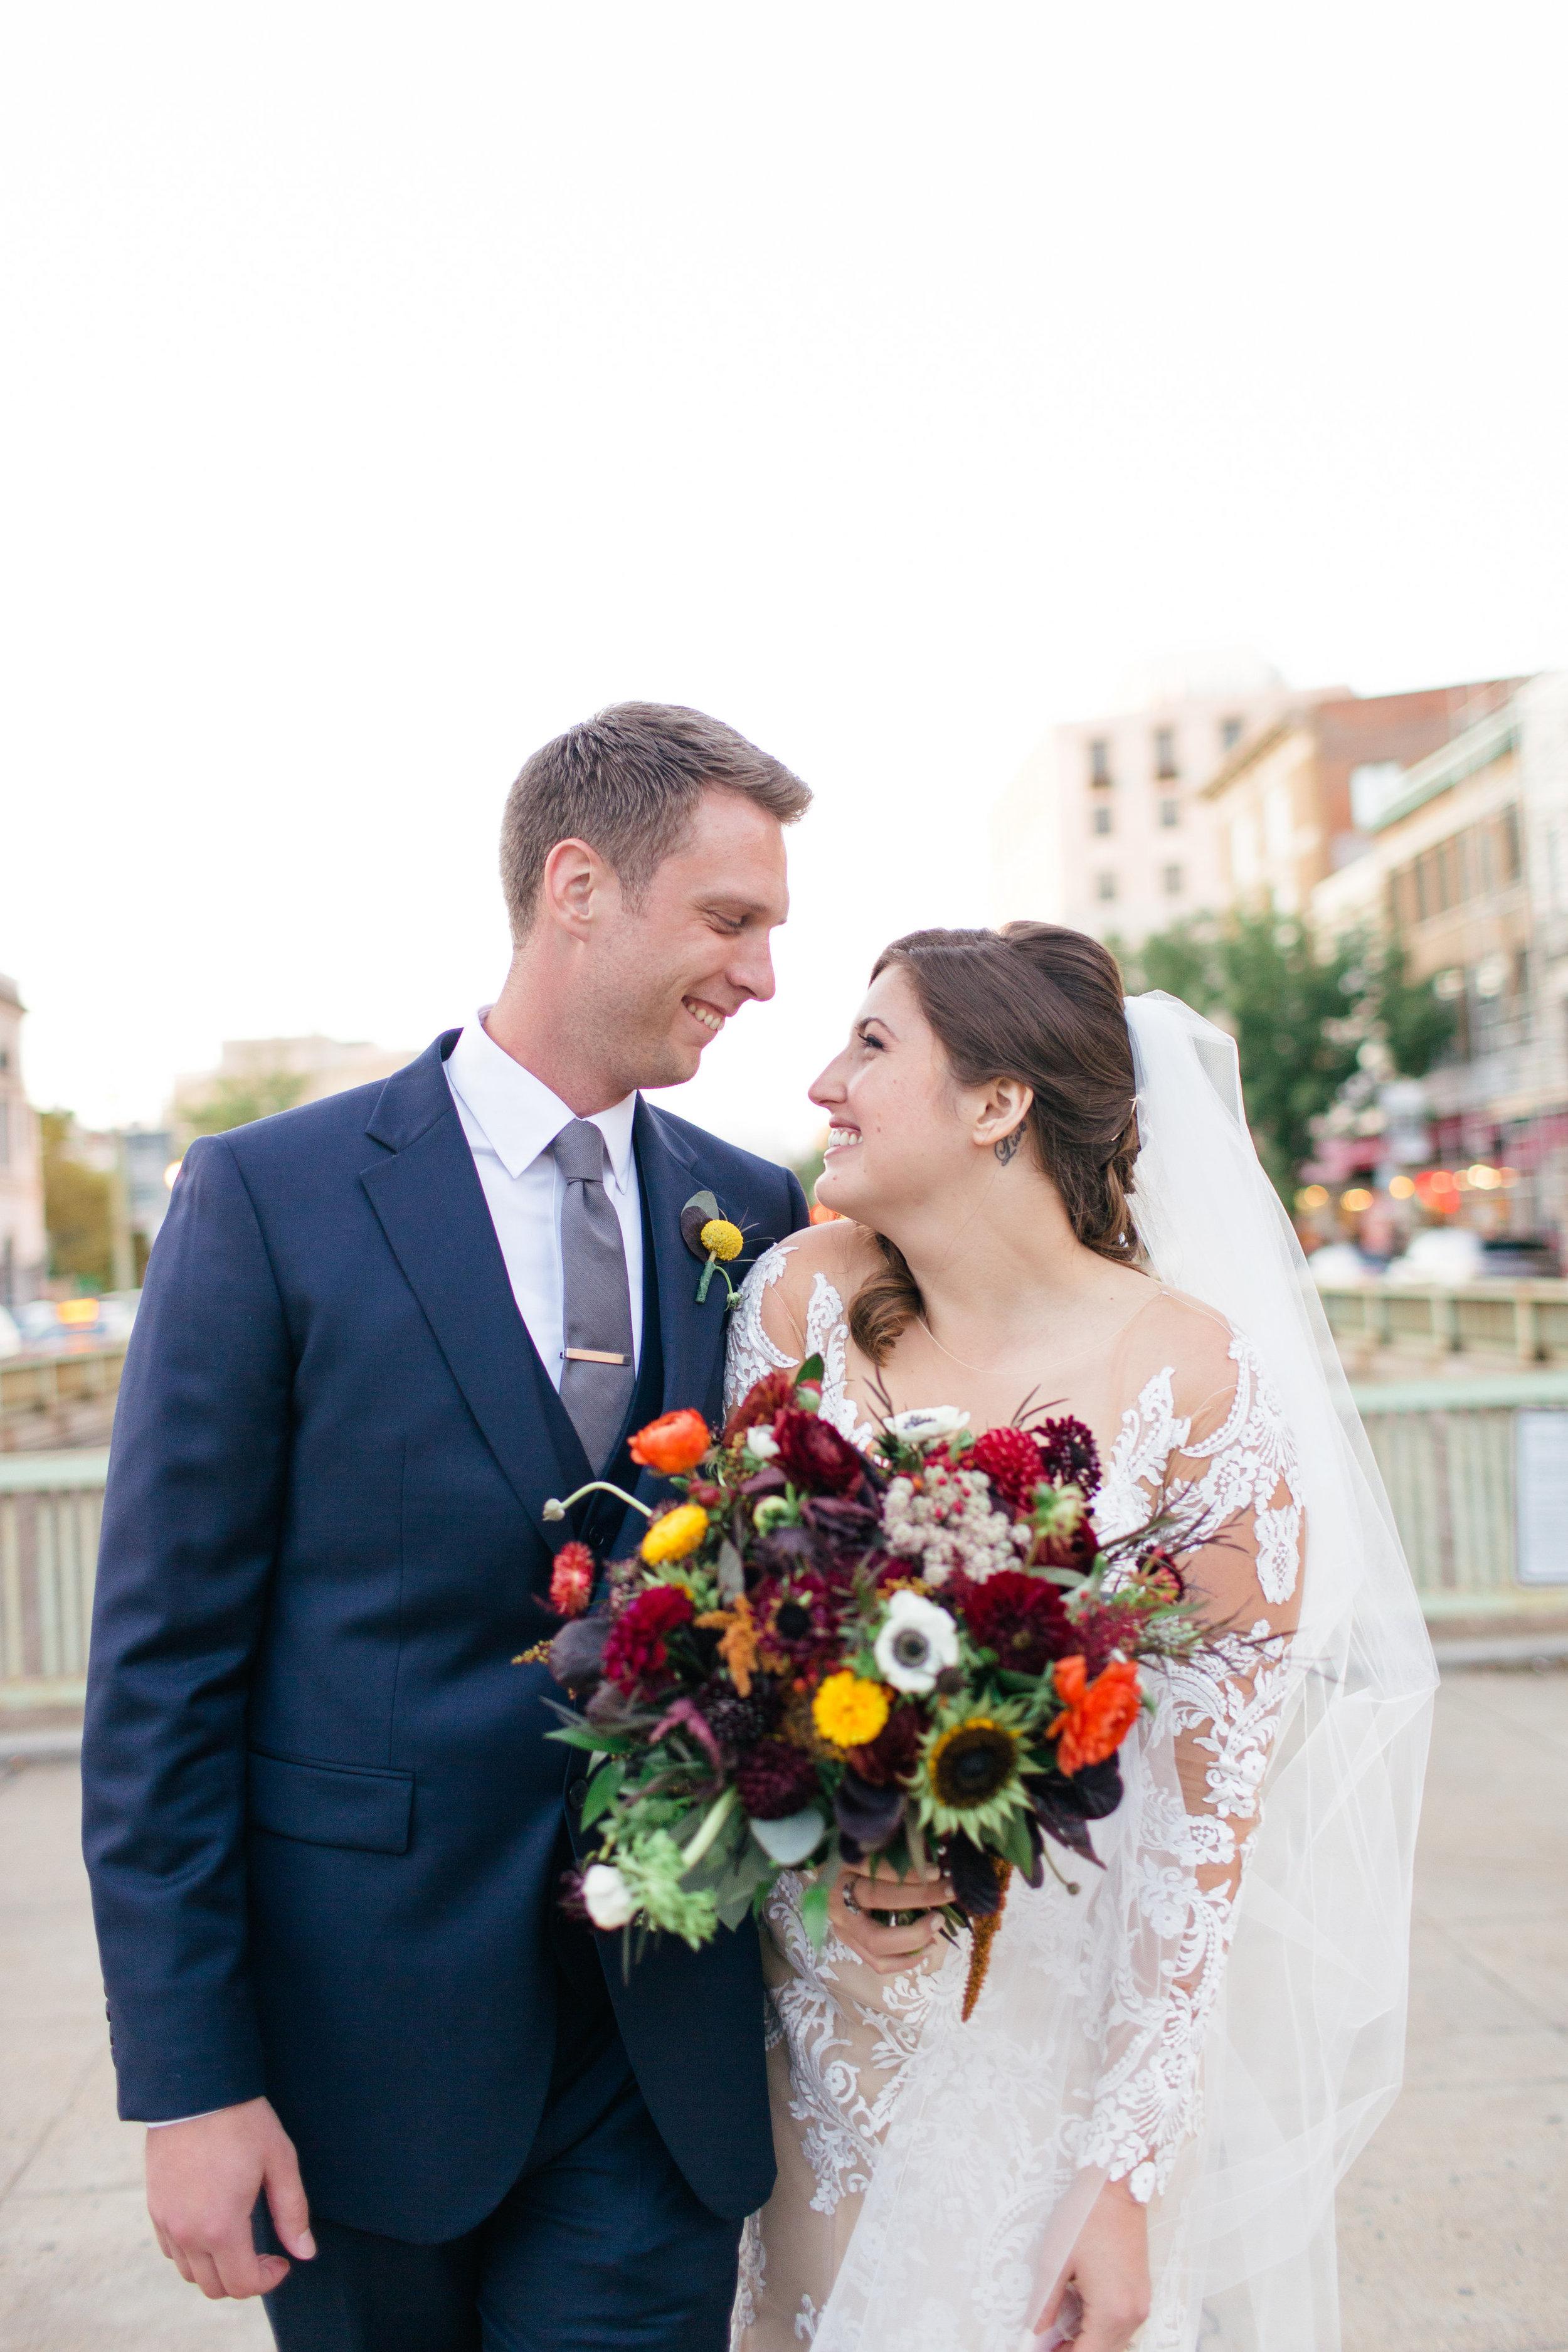 Dupon Circle Wedding | Washington DC Wedding Photography | Rebecca Wilcher Photography -32.jpg